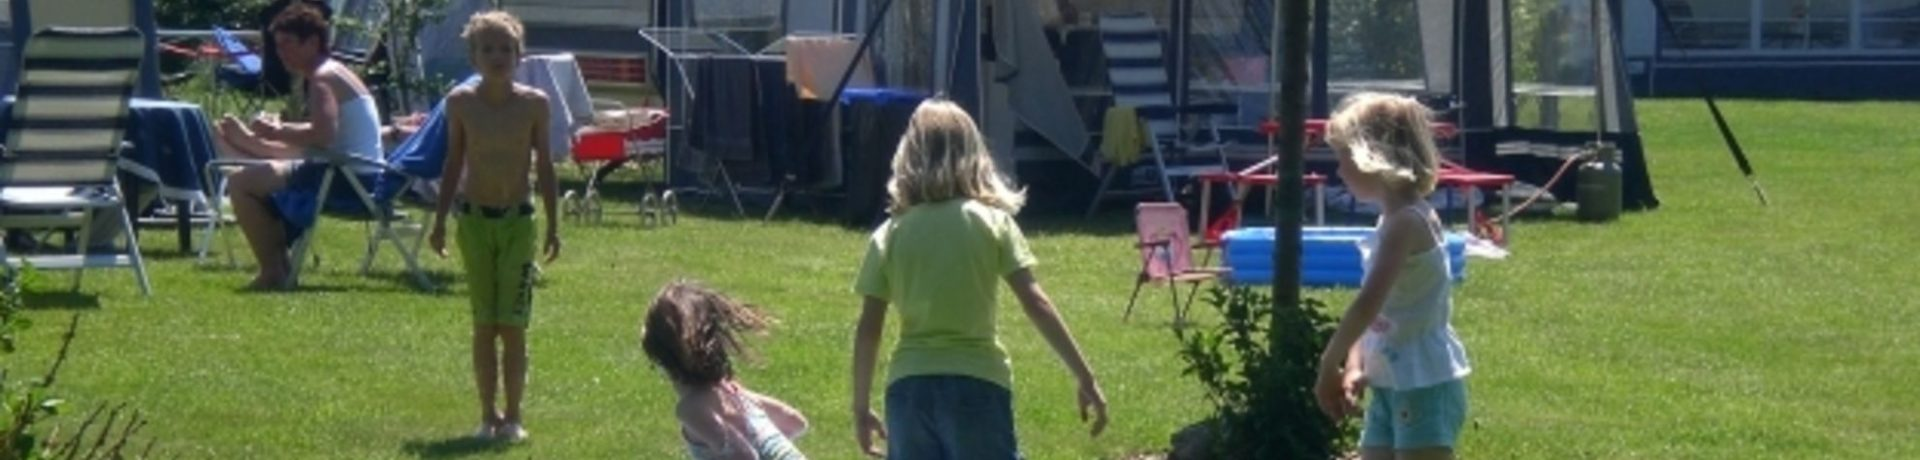 Minicamping Loeksham in Emmen ist ein Charme Camping in Drente.